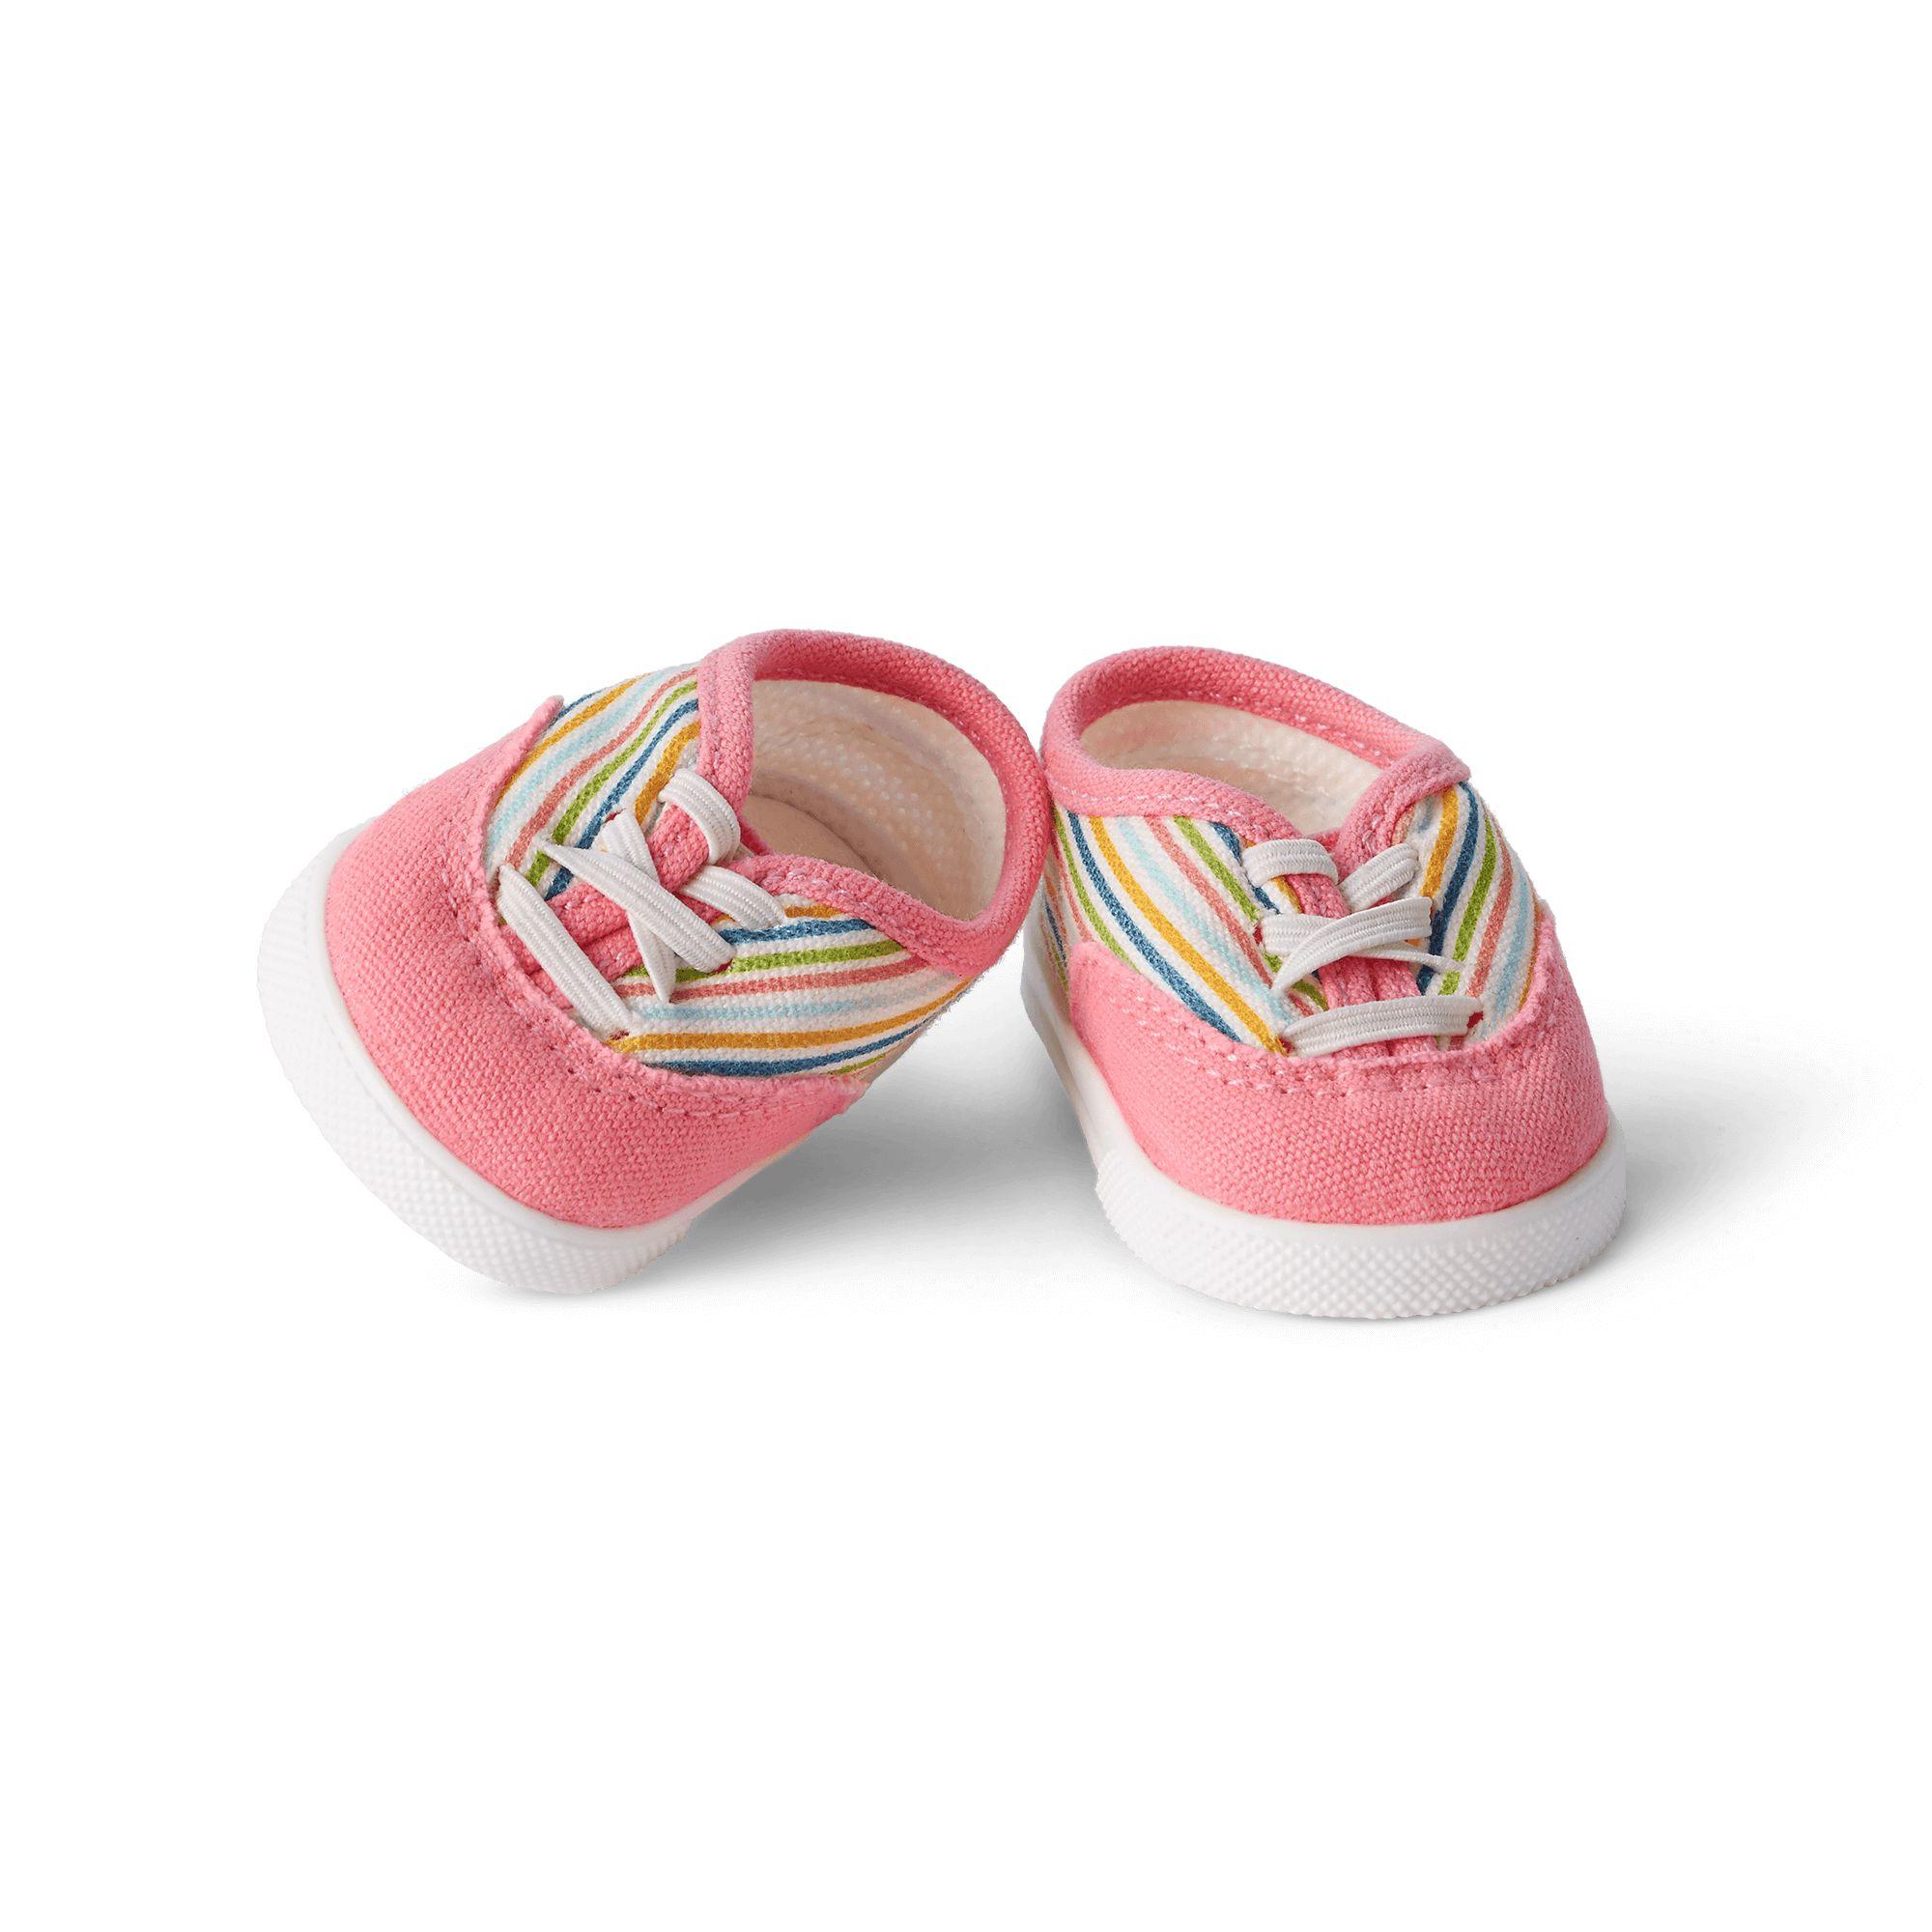 Colorful Stripes Shoes